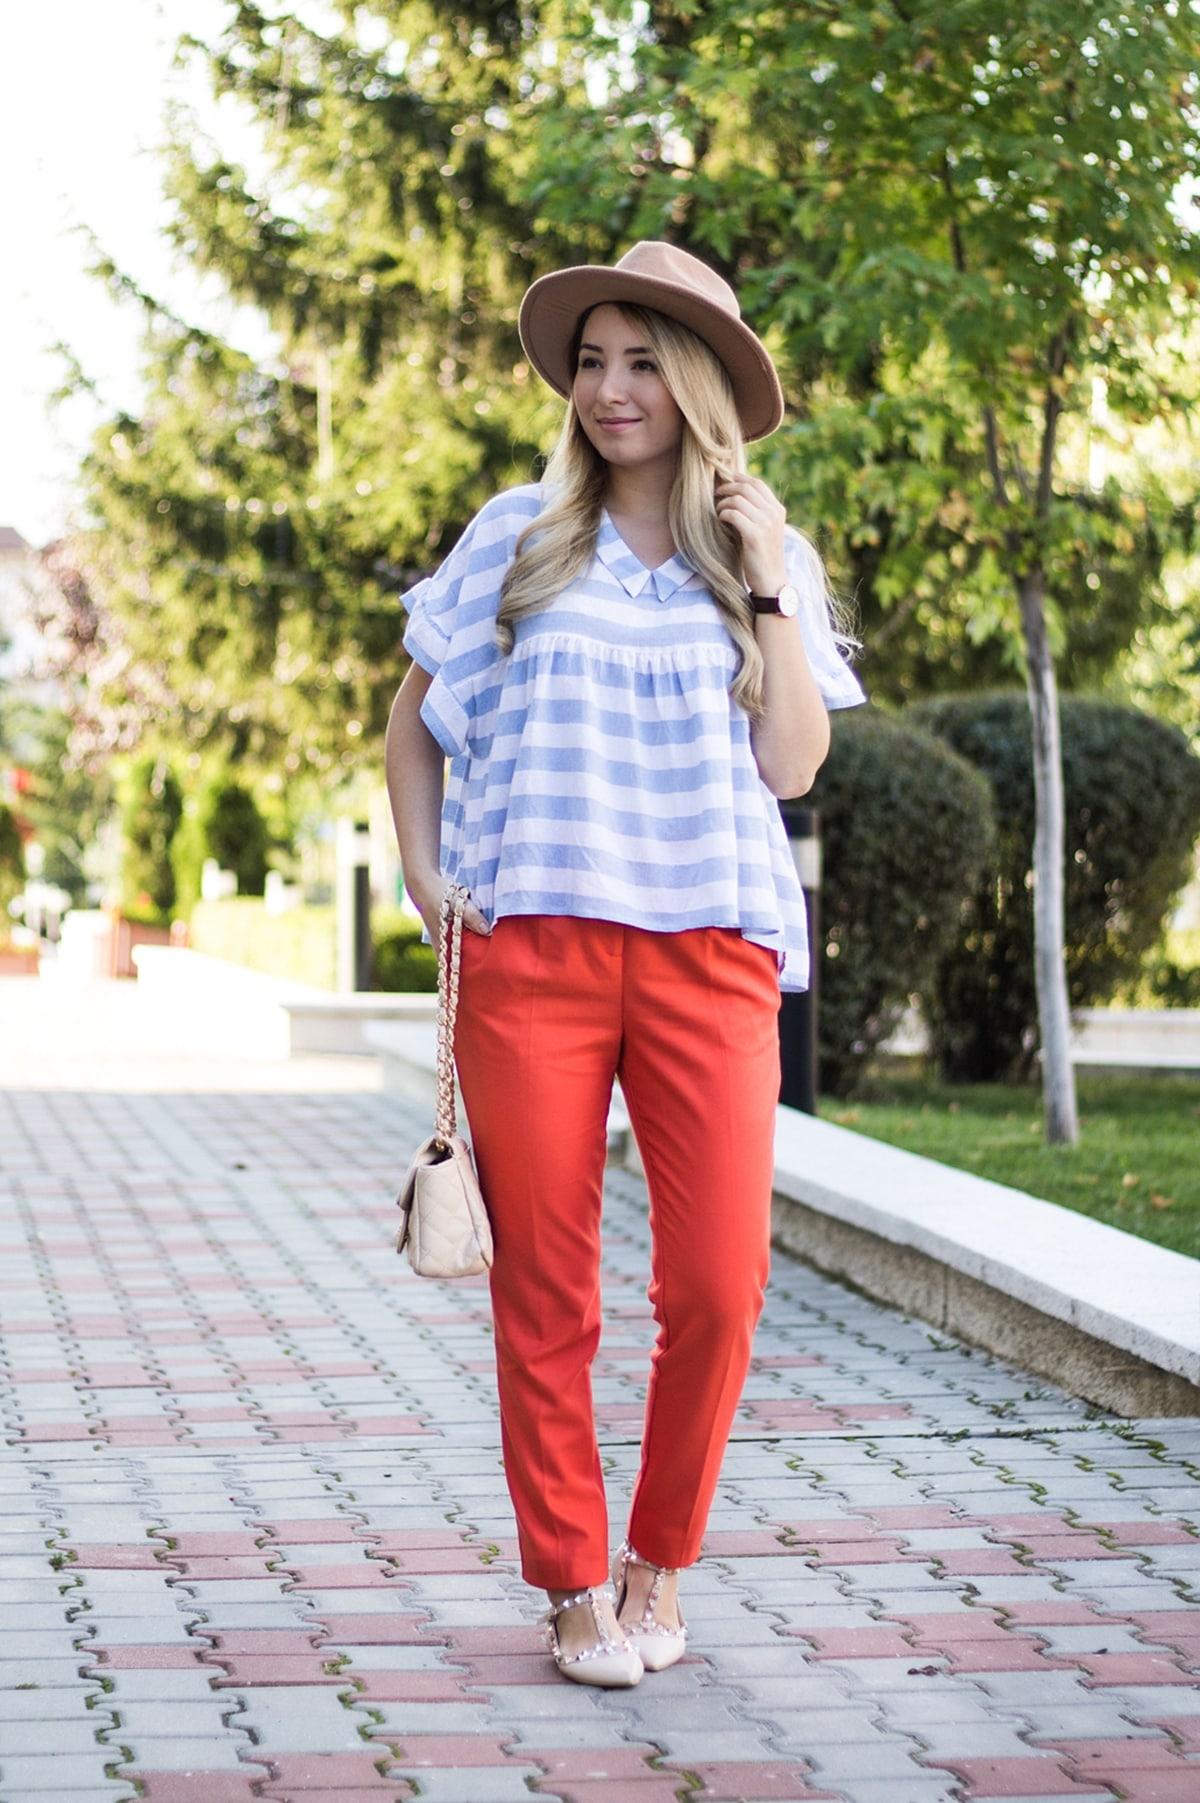 Cum sa porti o pereche de pantaloni orange/portocalii? tinuta de toamna andreea ristea